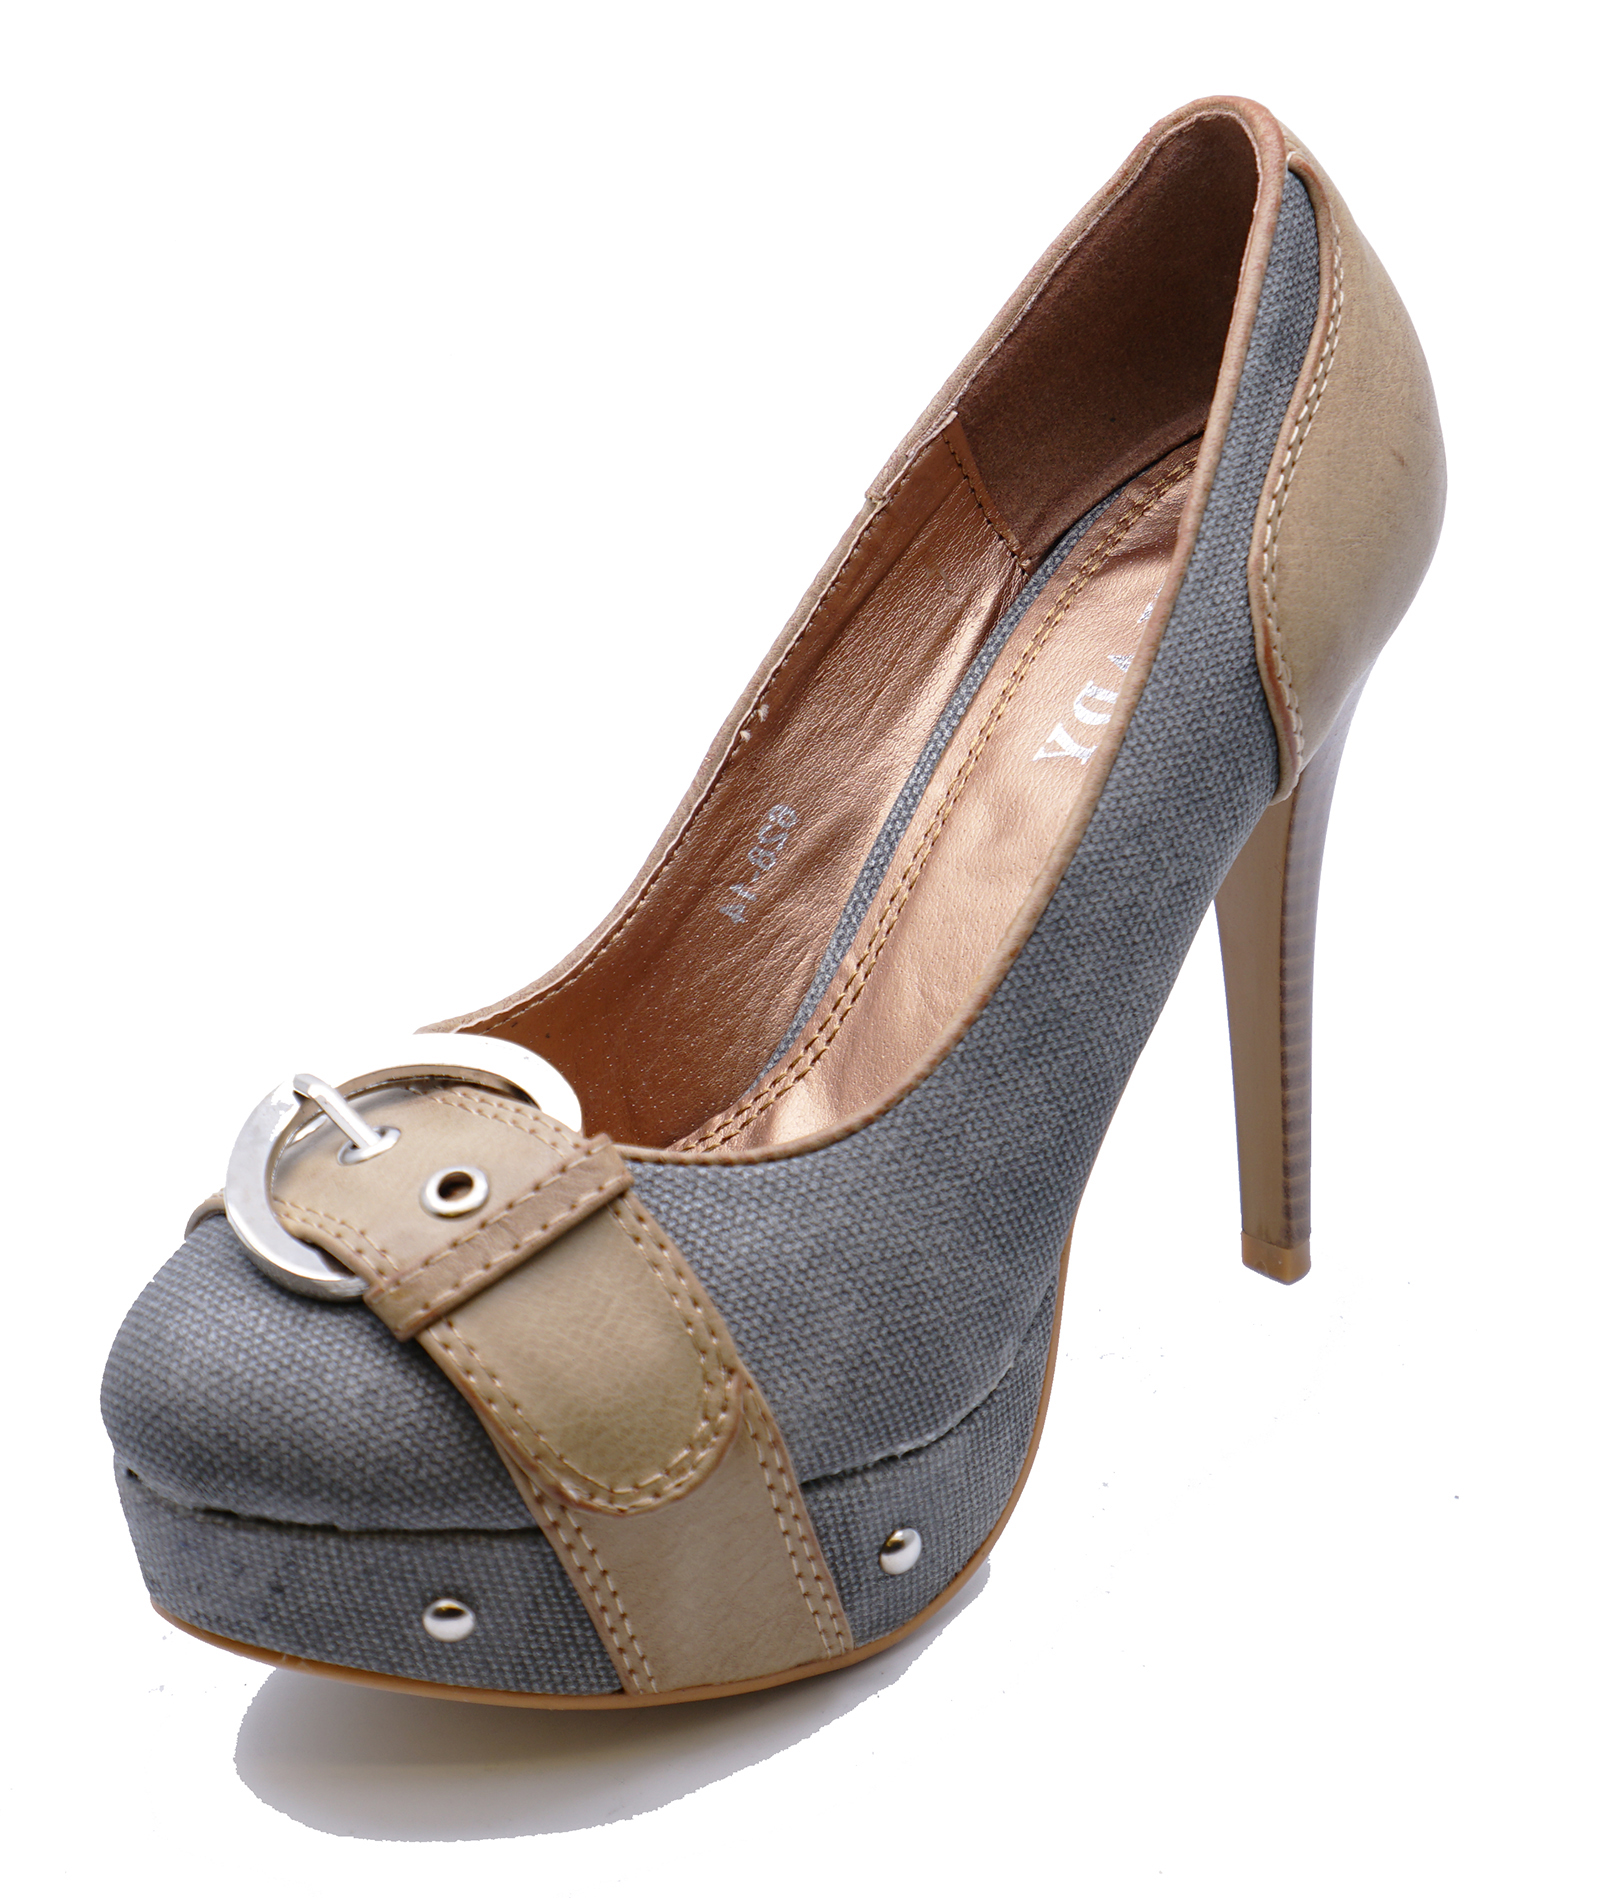 PLATFORM HIGH HEEL BLACK CHELSEA ANKLE SUEDE EFFECT SLIP-ON BOOT SHOES SIZES 3-8